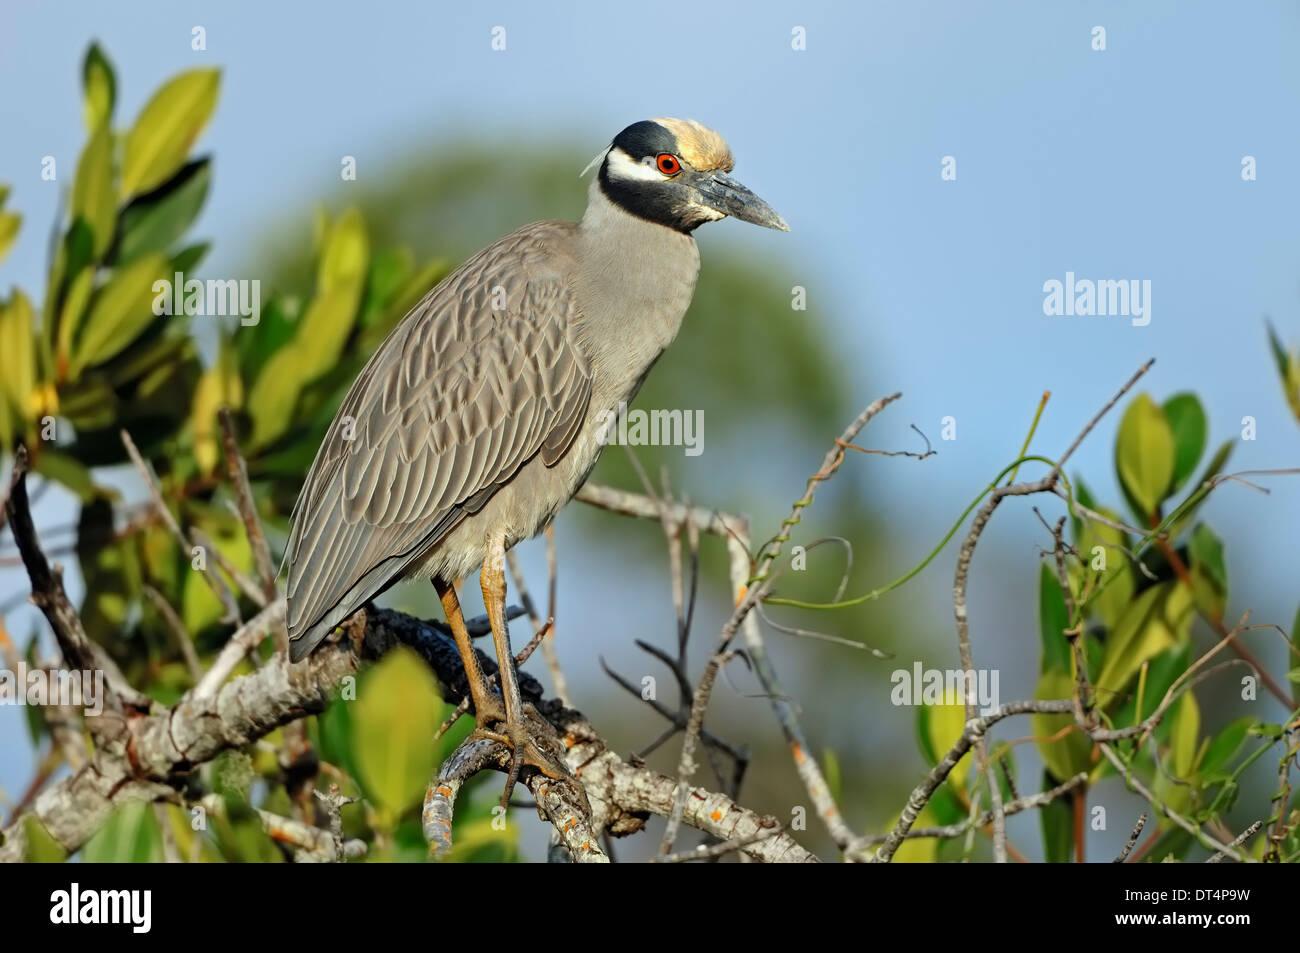 Yellow-crowned Night Heron or American Night Heron (Nycticorax violaceus), Sanibel Island, Florida, USA - Stock Image